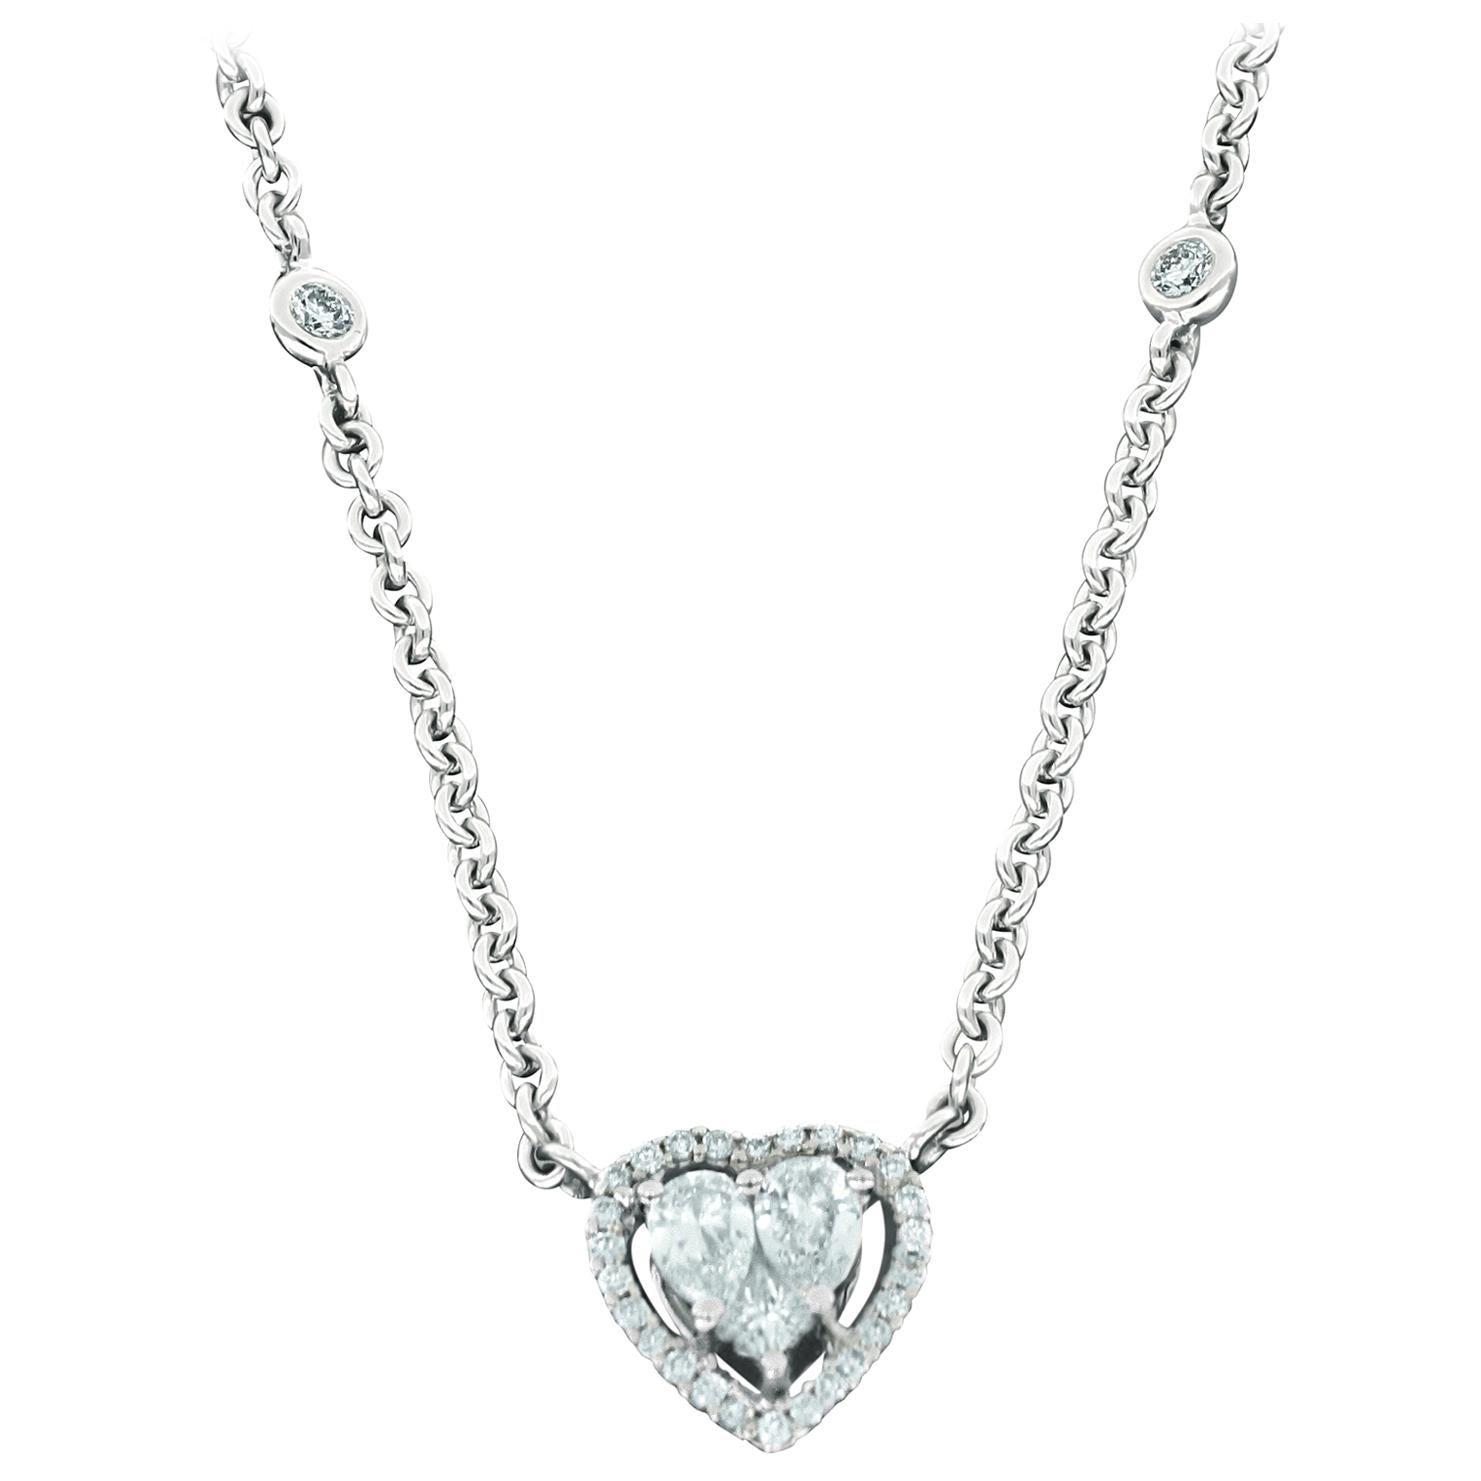 Amwaj White Gold 18 Karat Pendant with Diamonds